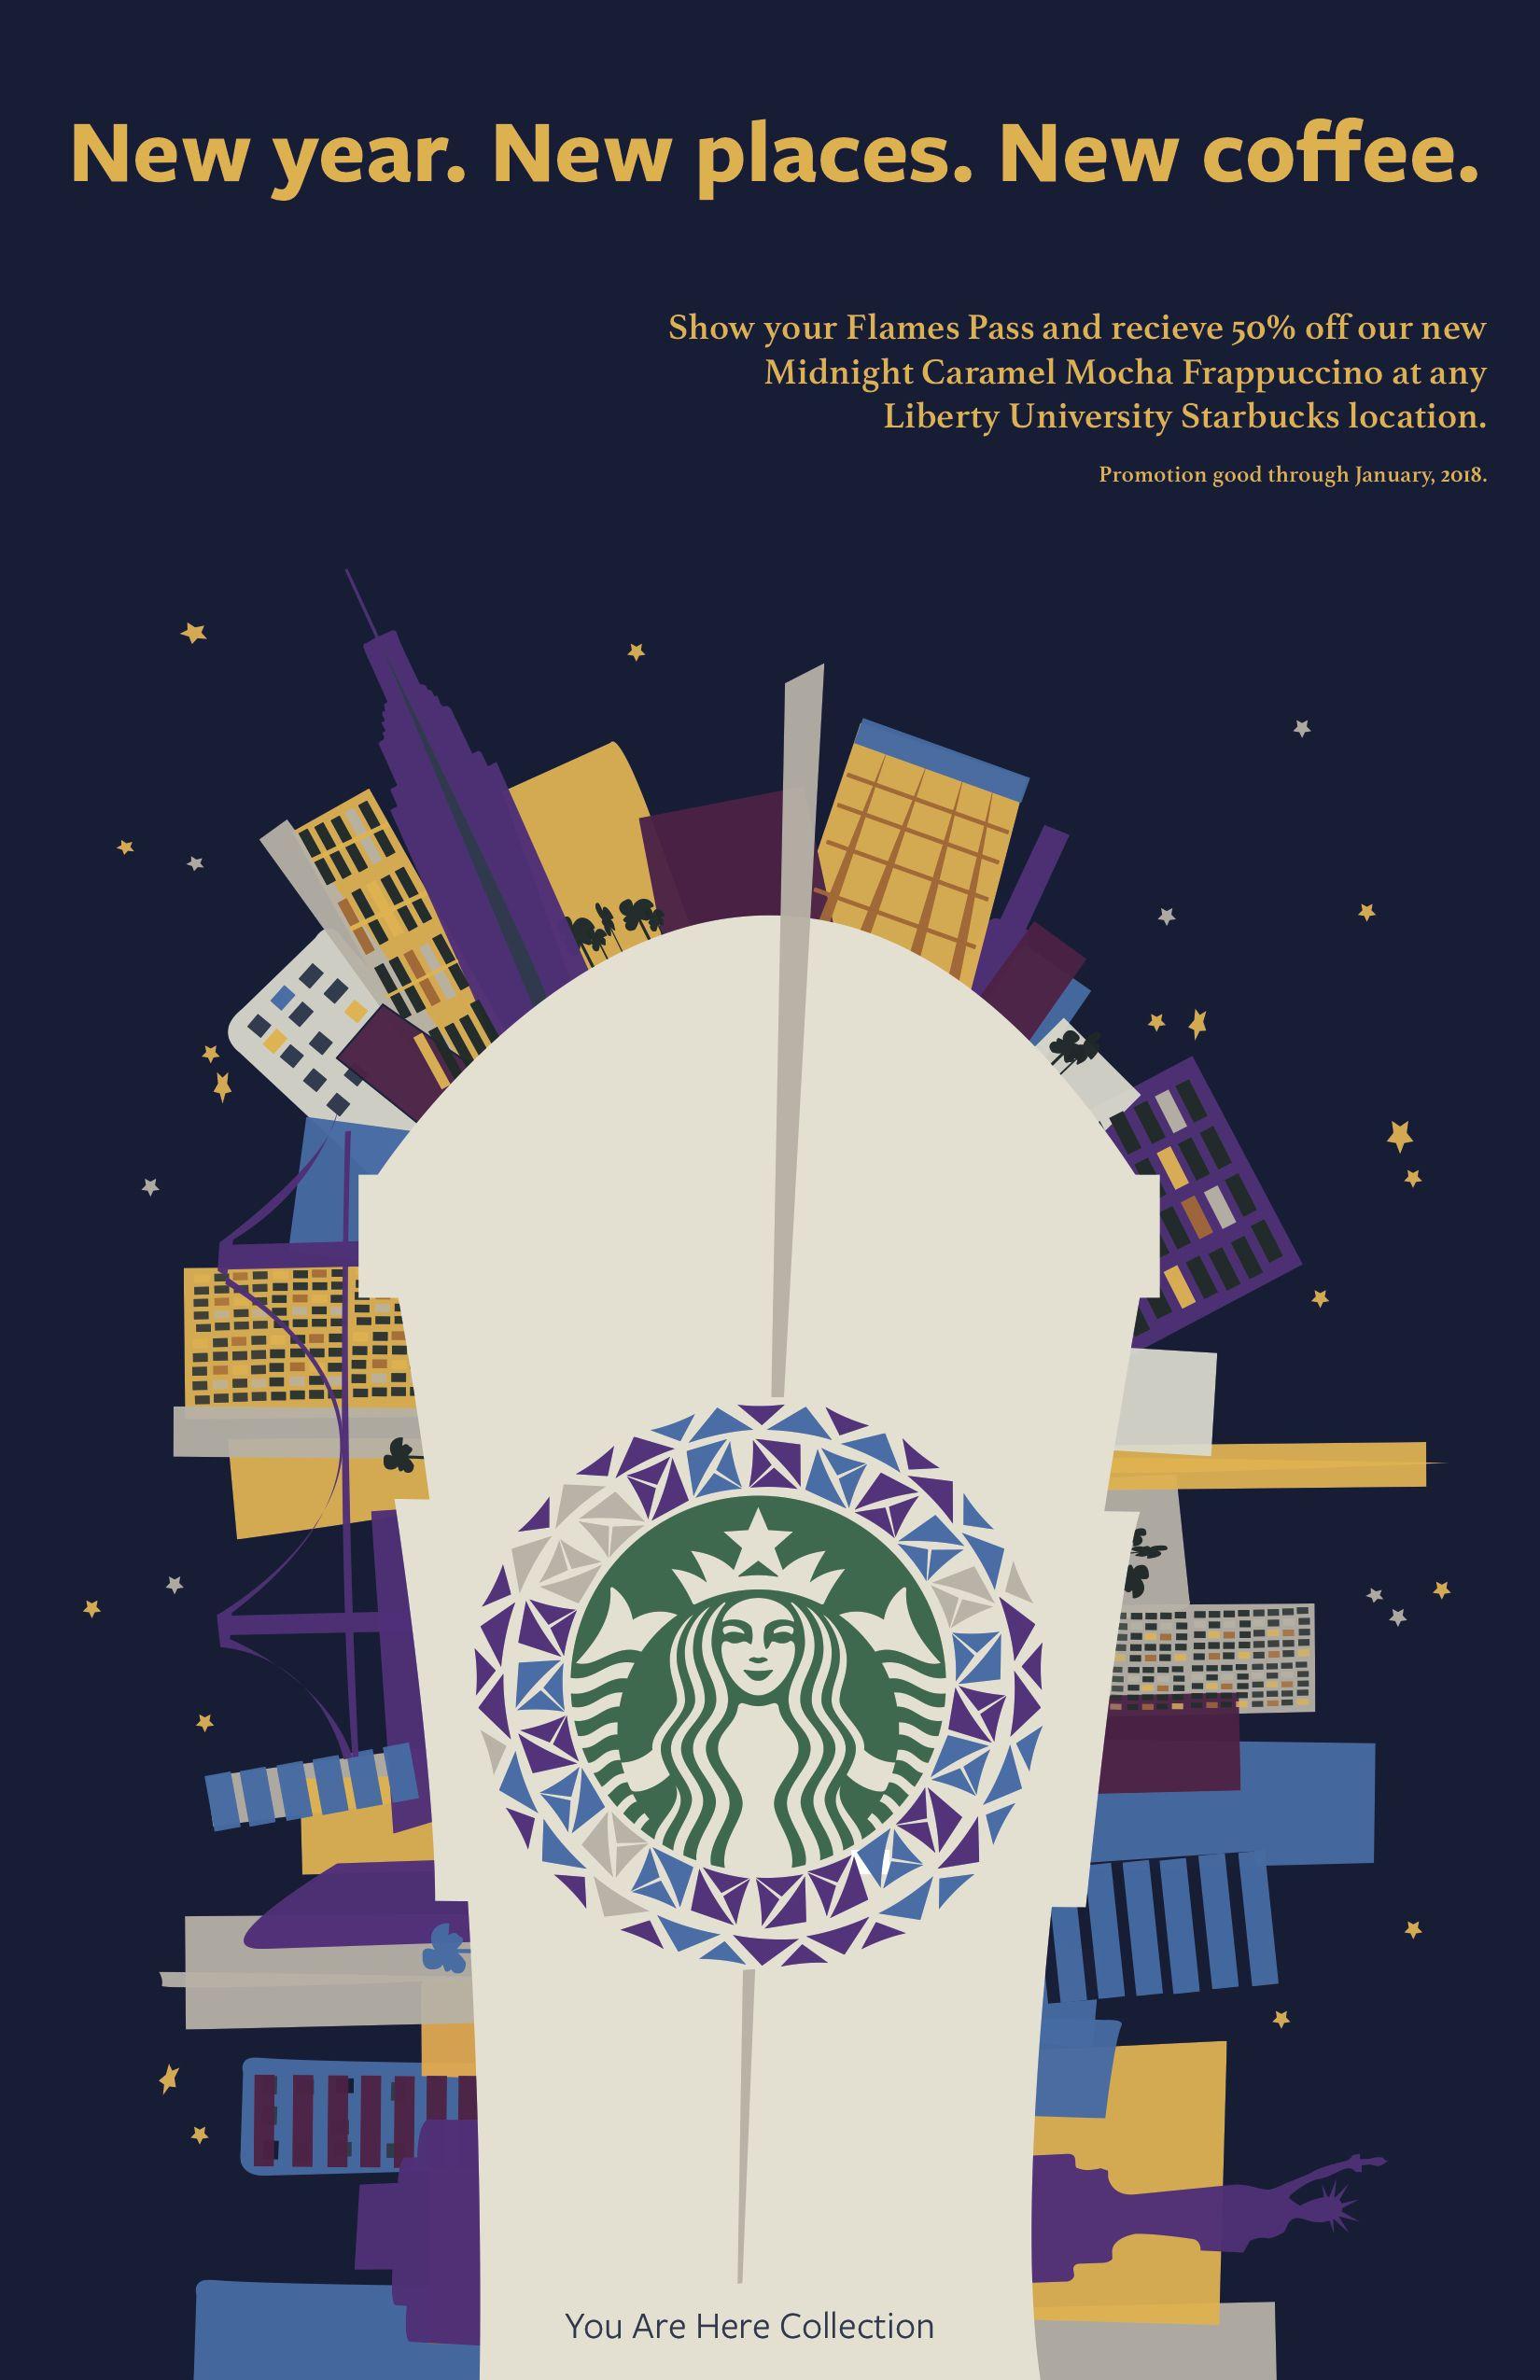 Starbucks Promo Poster Starbucks Poster Starbucks Promotion